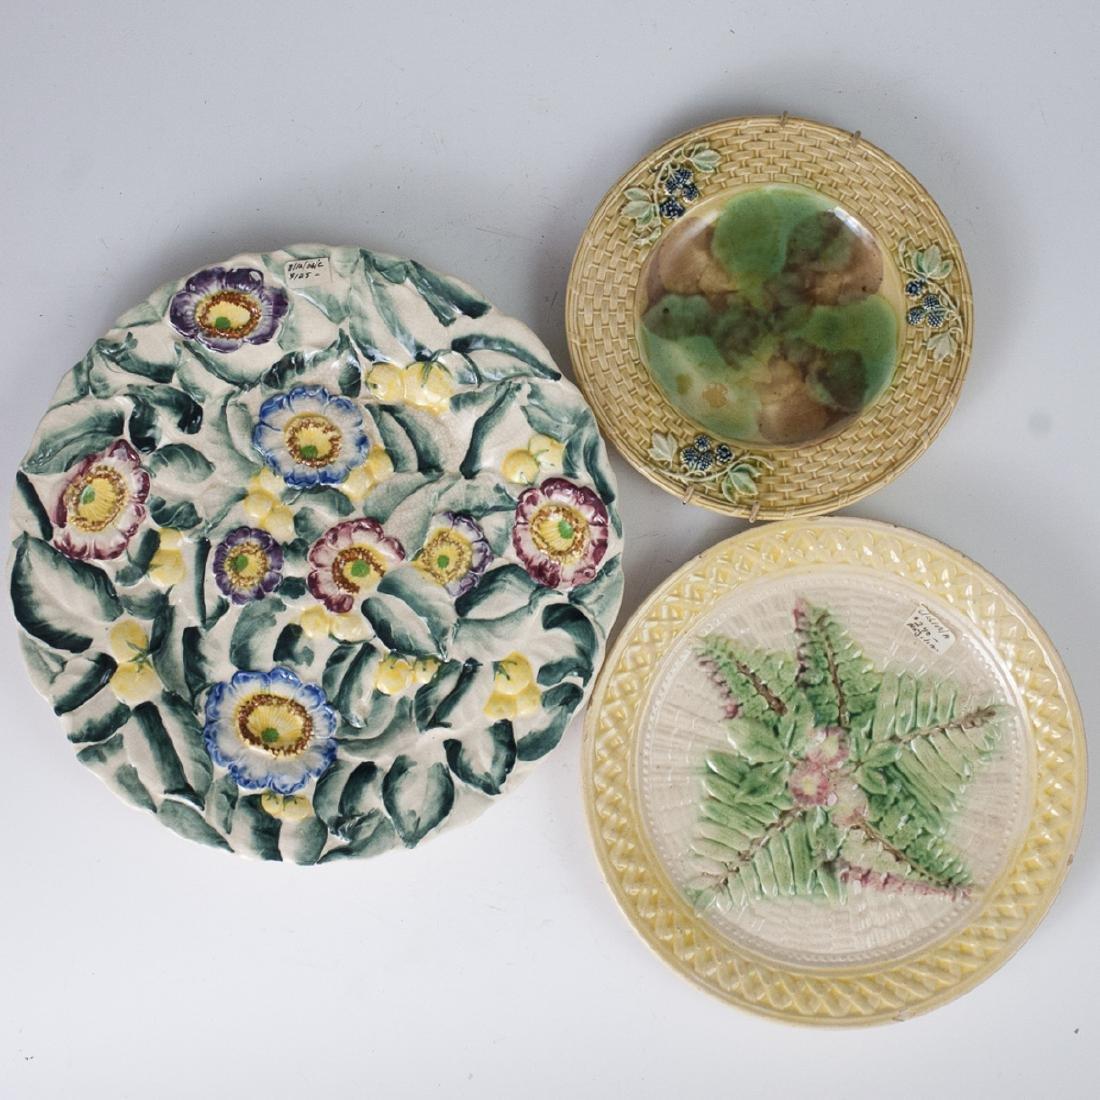 Vintage Majolica Glazed Plates